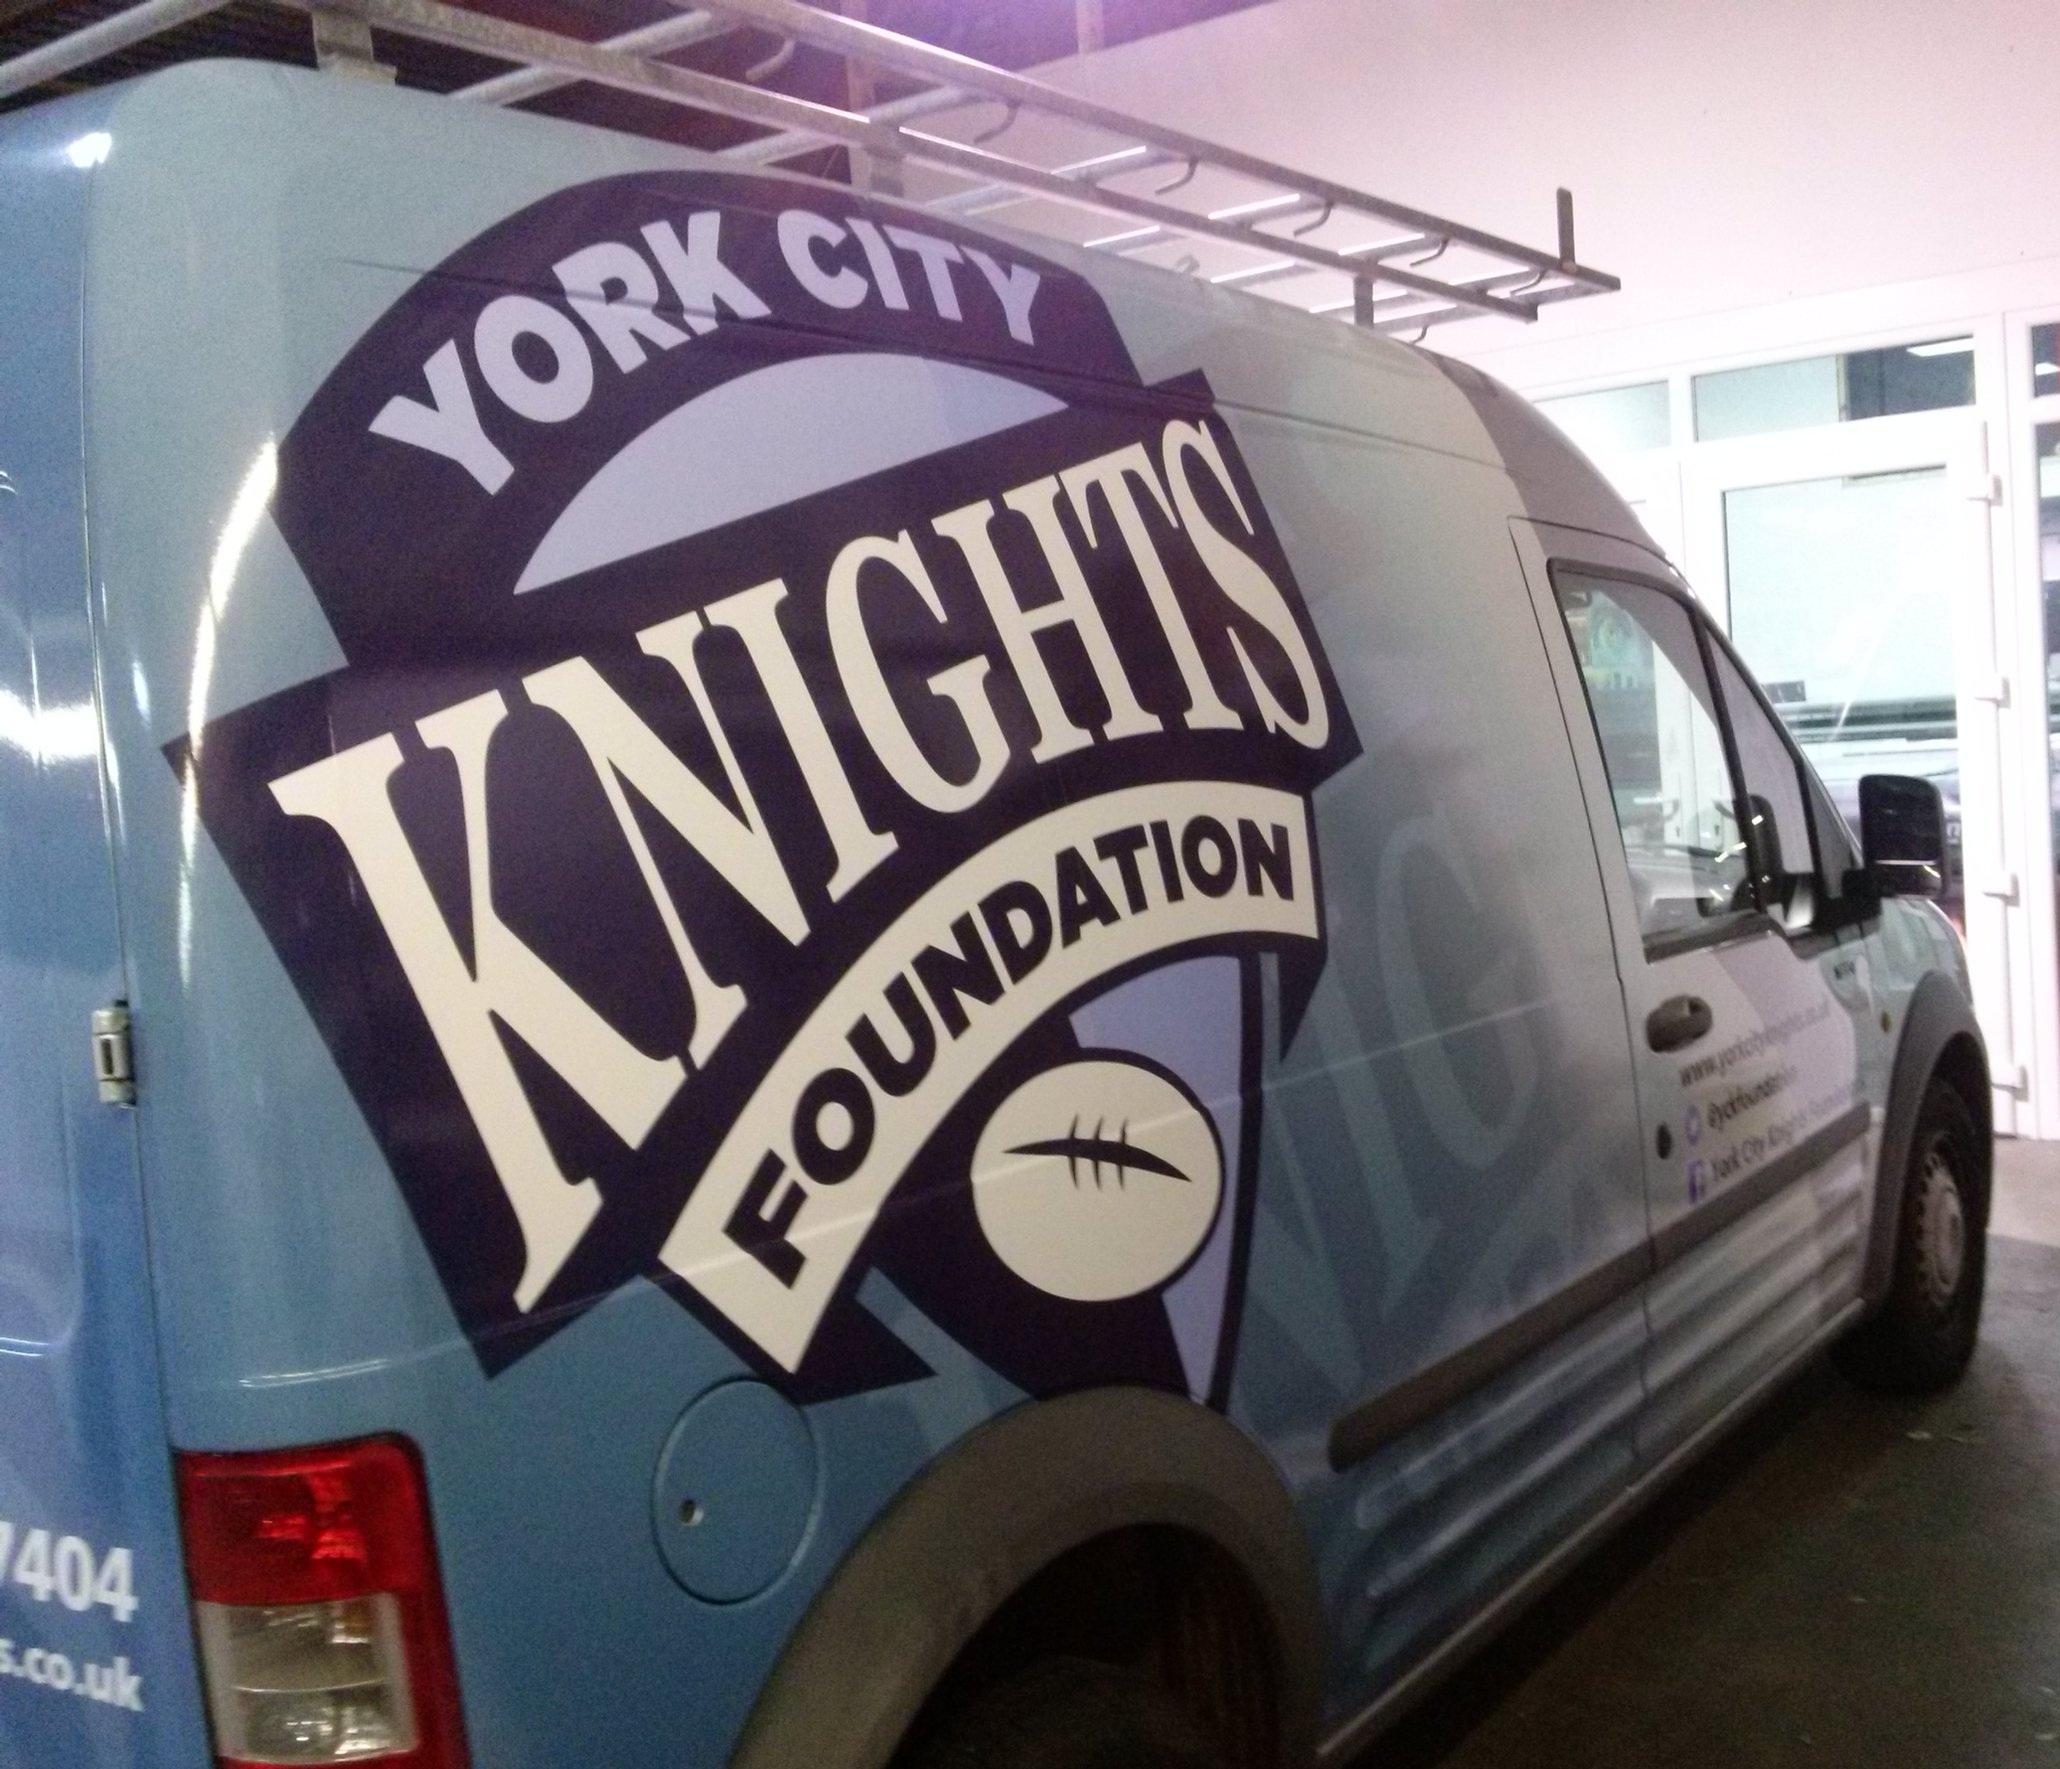 YORK CITY KNIGHTS   Full vehicle van wrap.